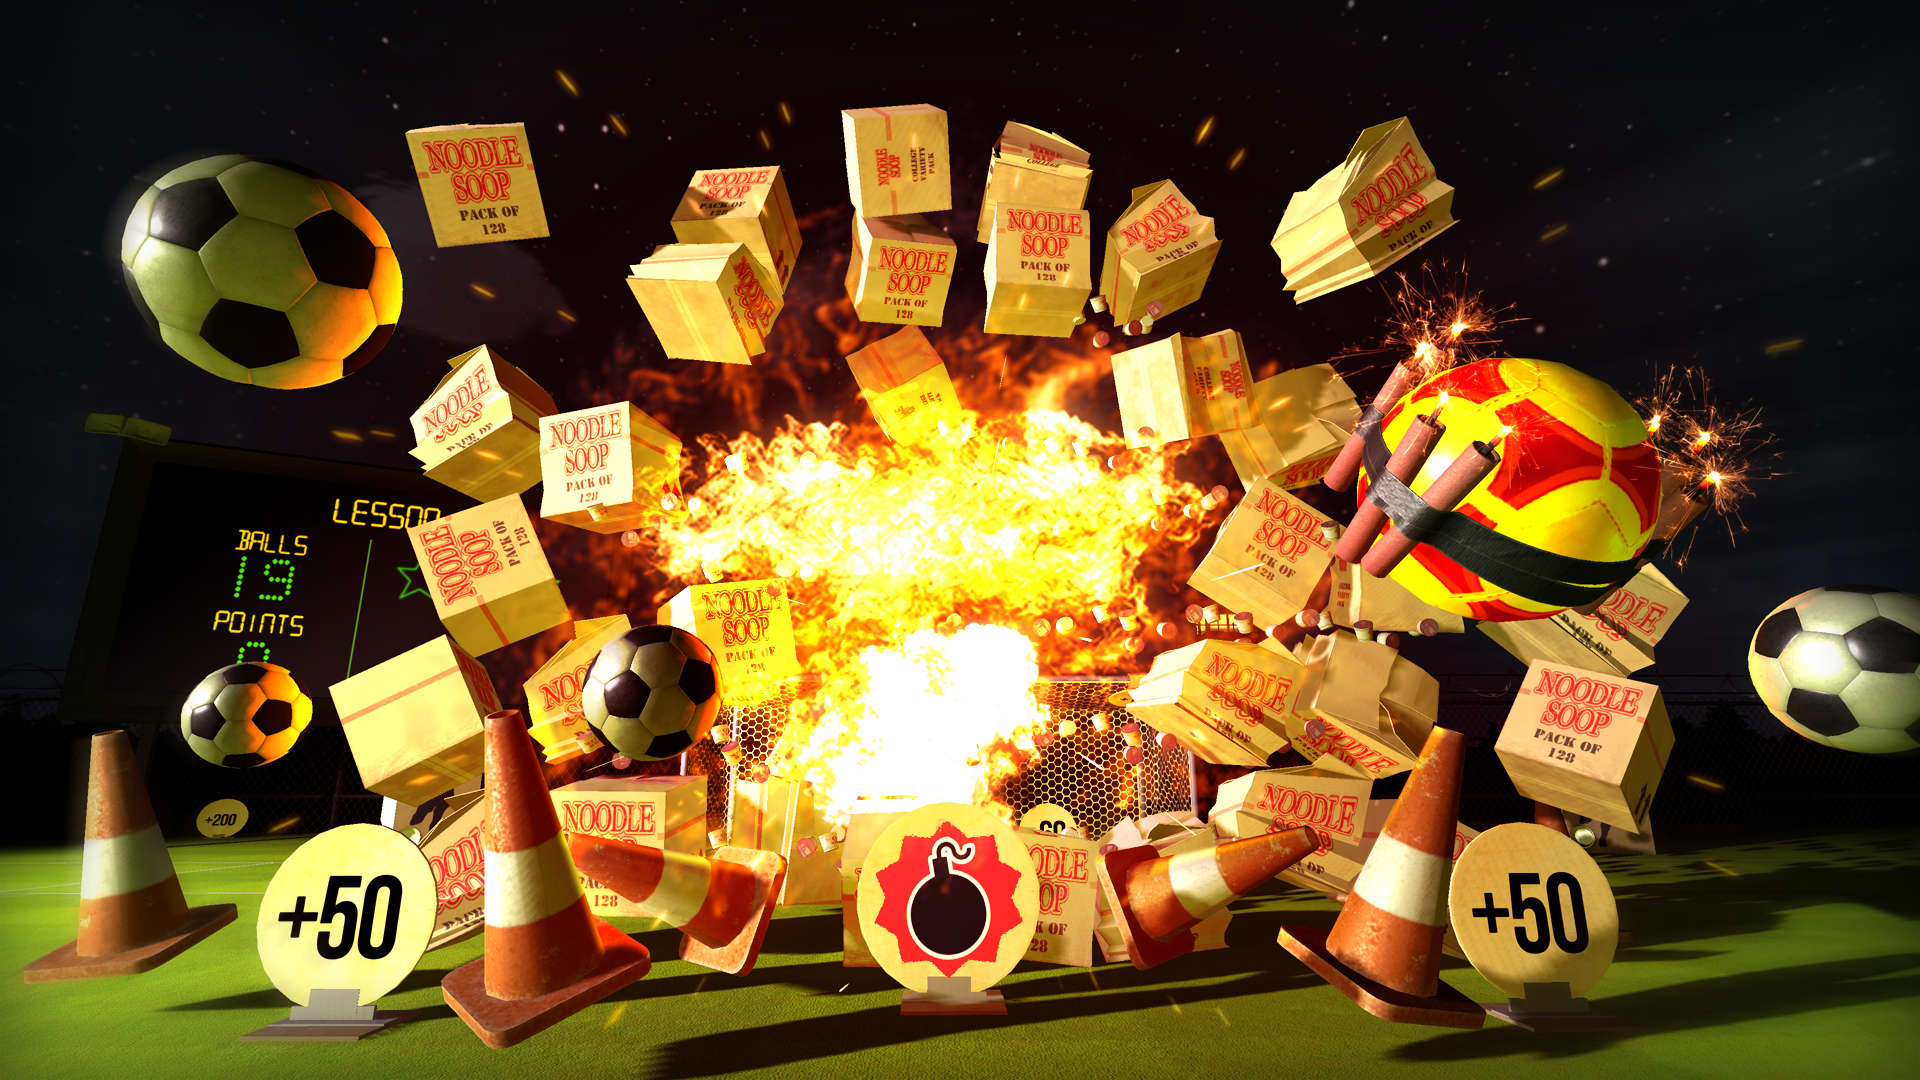 HM_ExplodingBall_1080.png